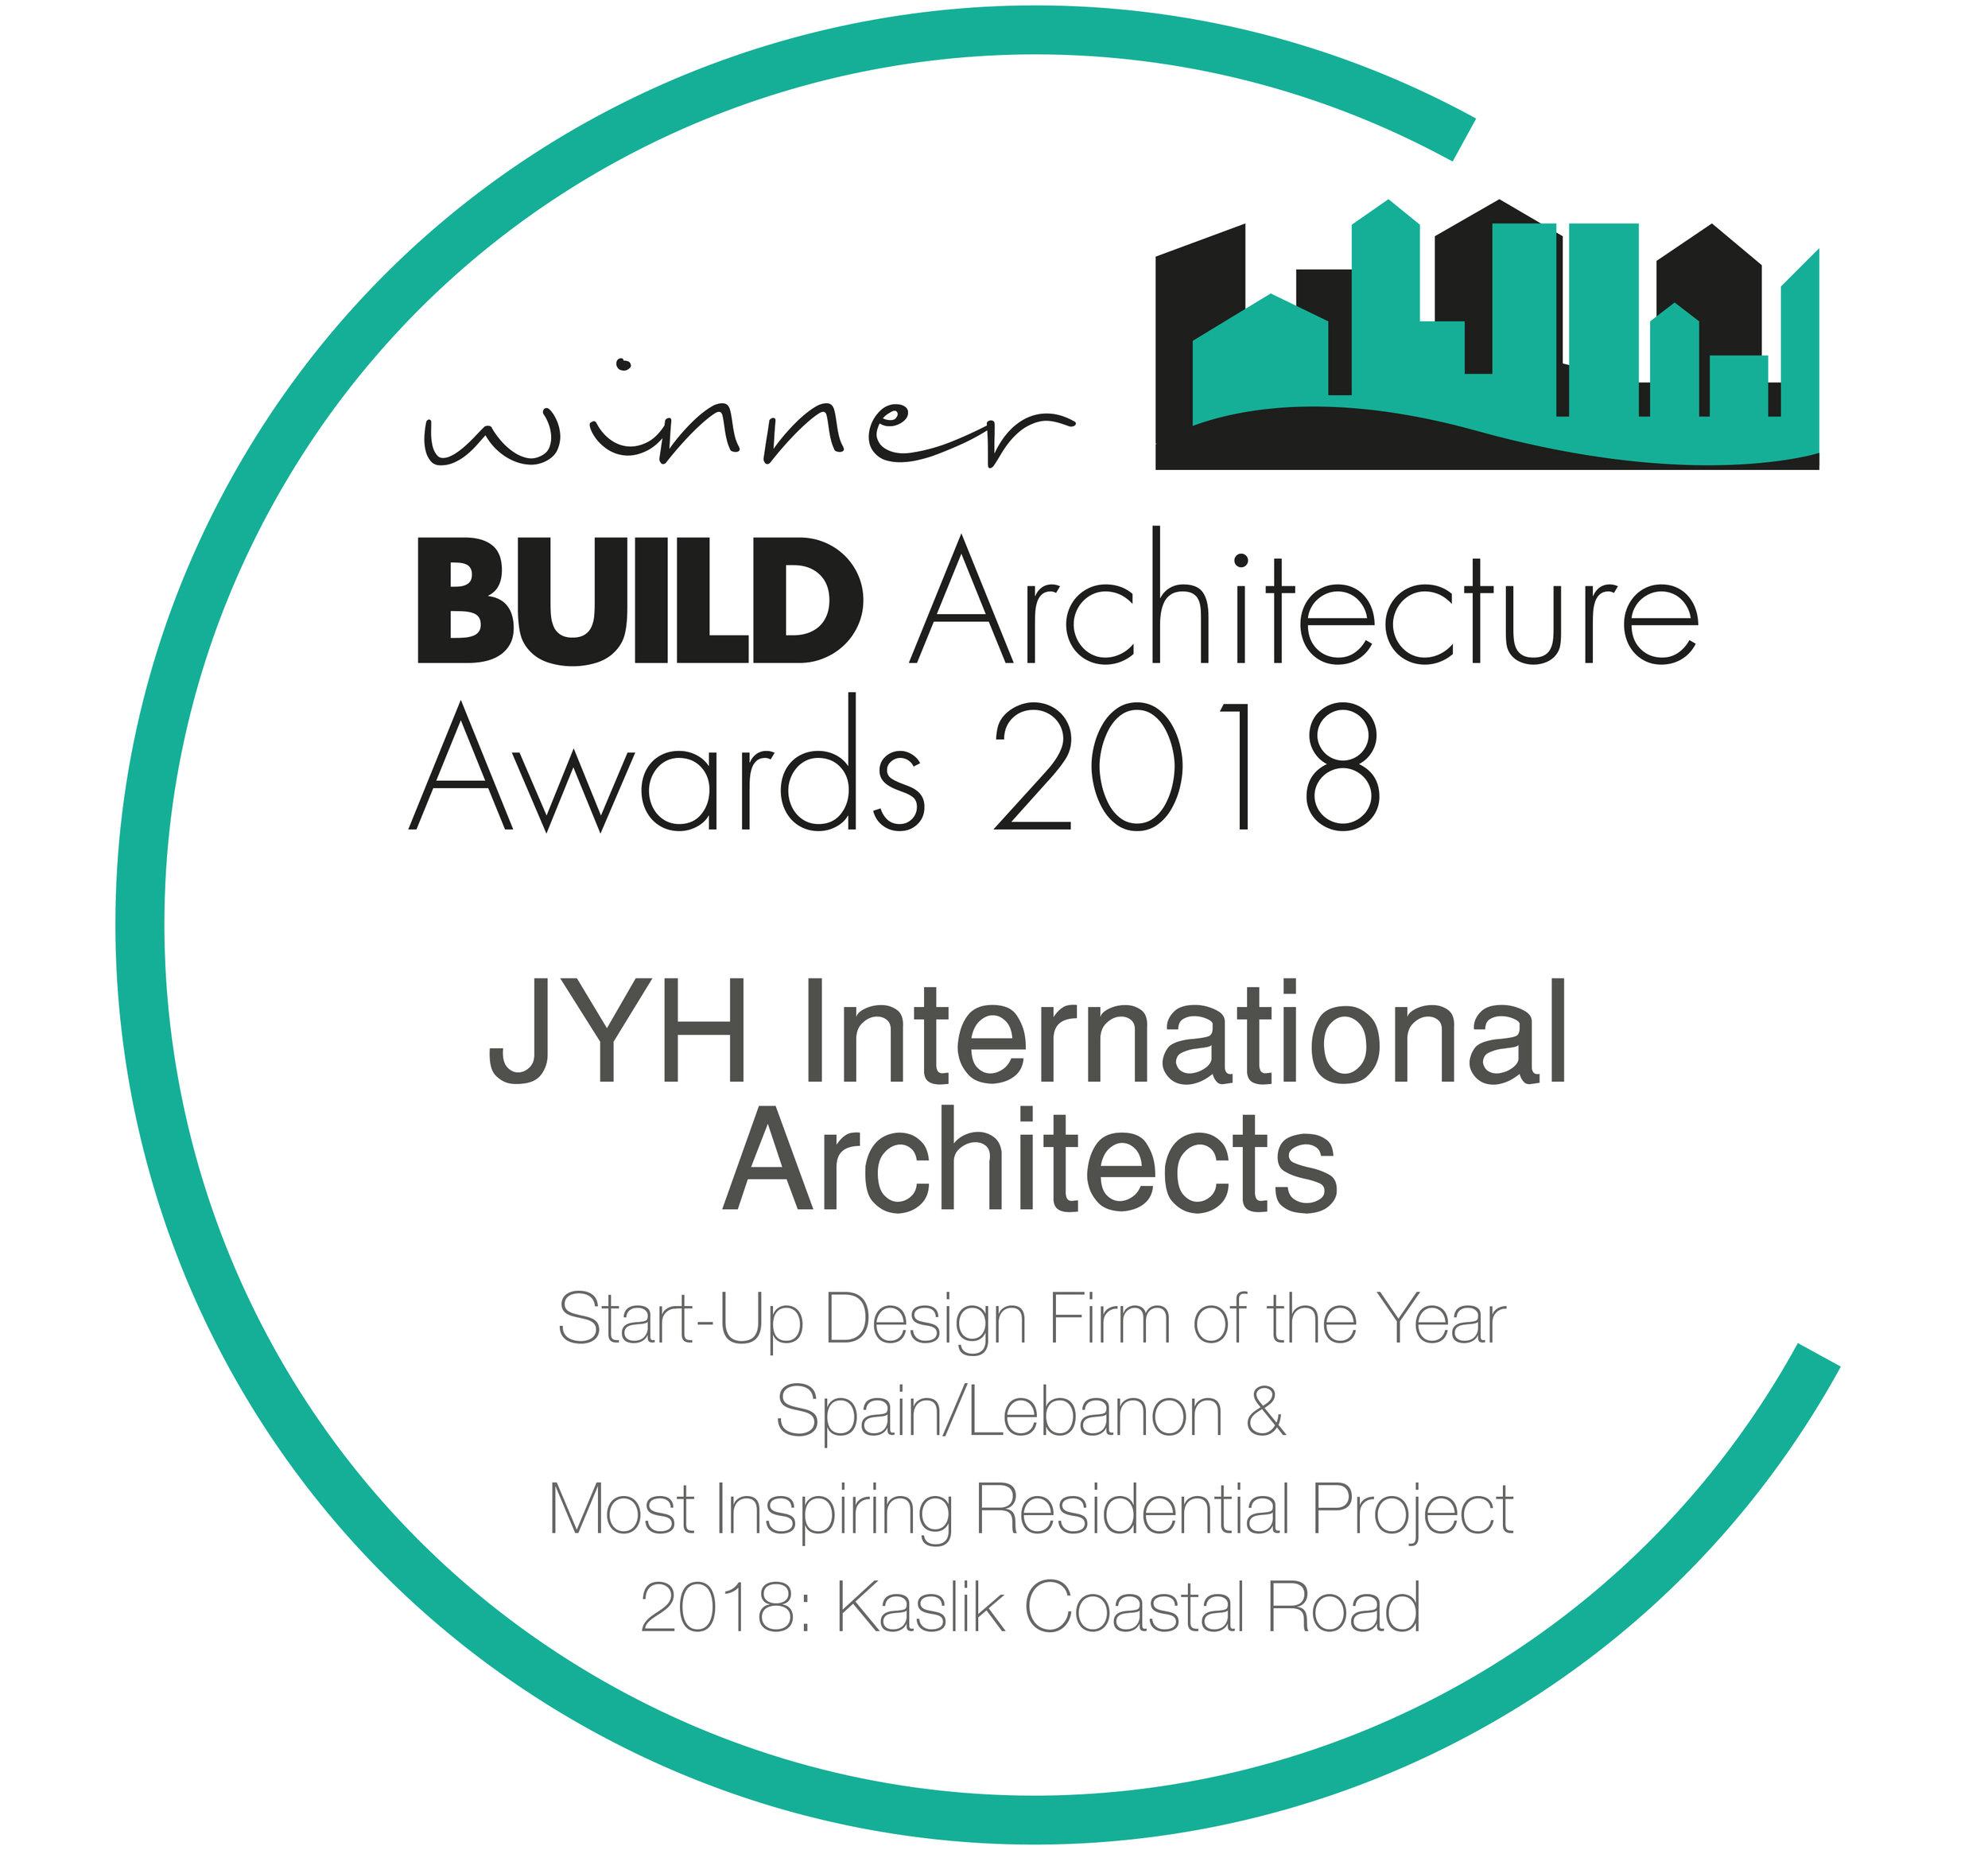 JYH International Architects Build Award